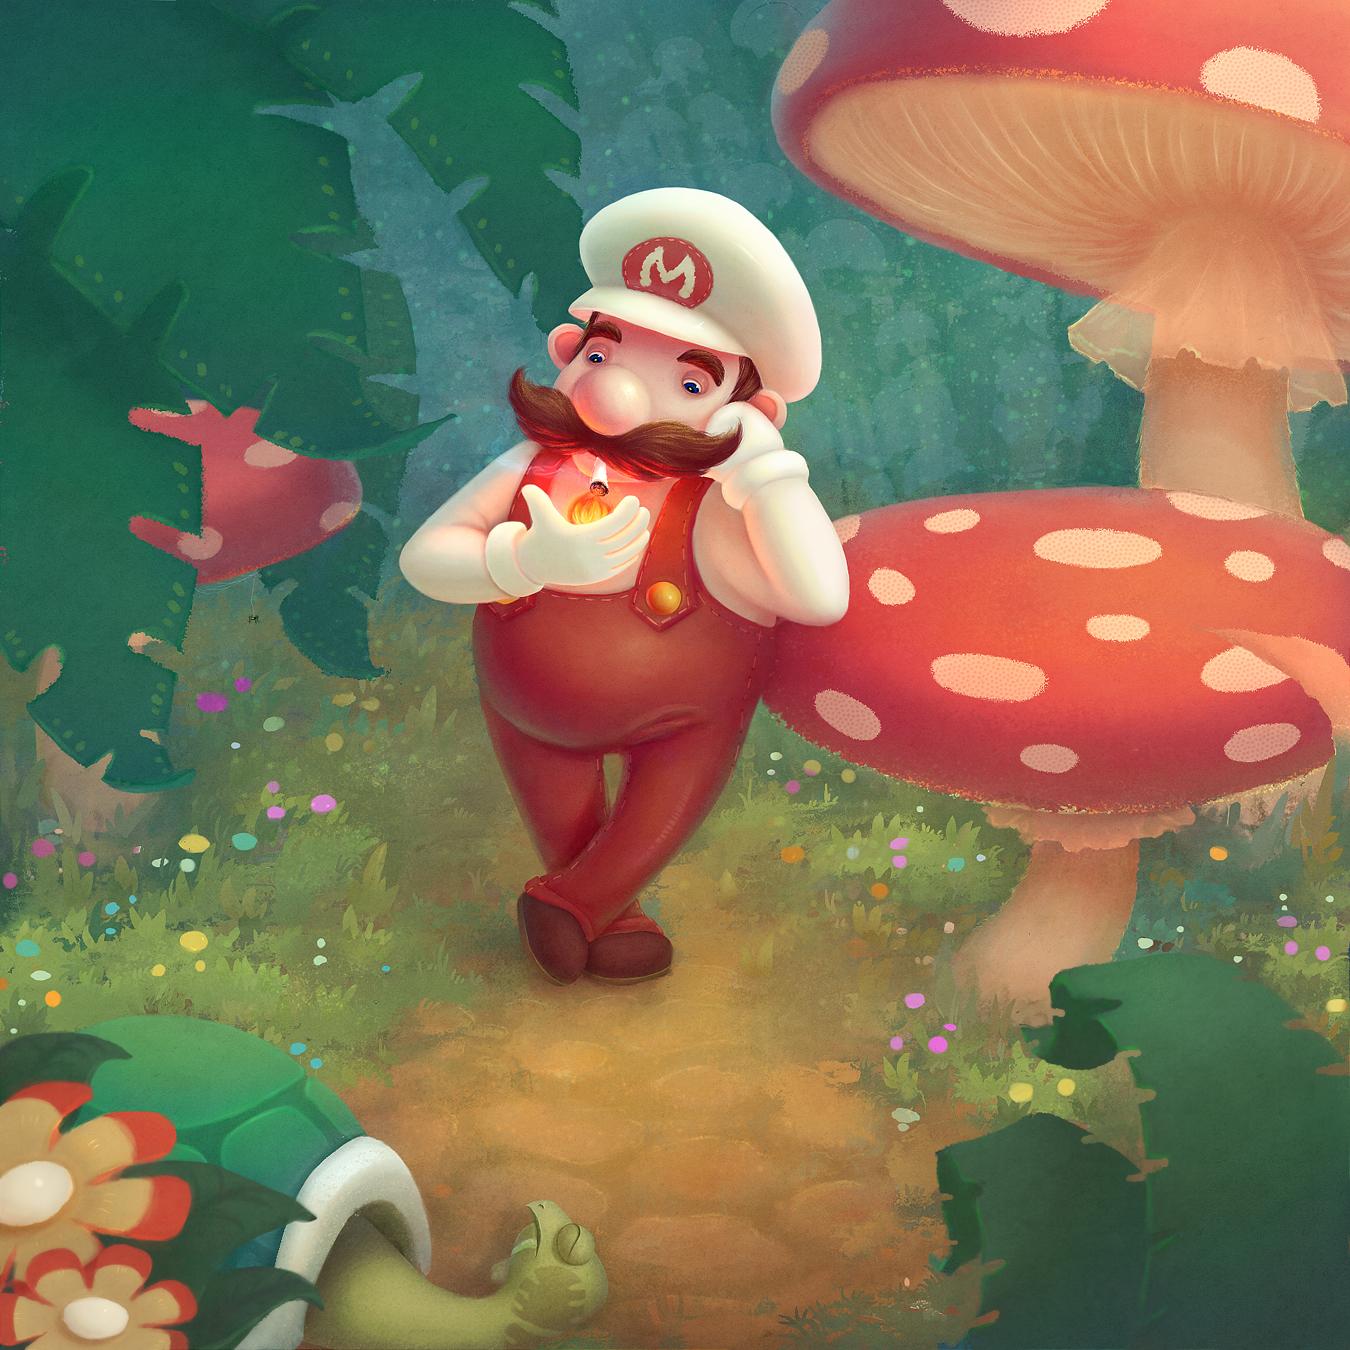 Mario by Naphanyah